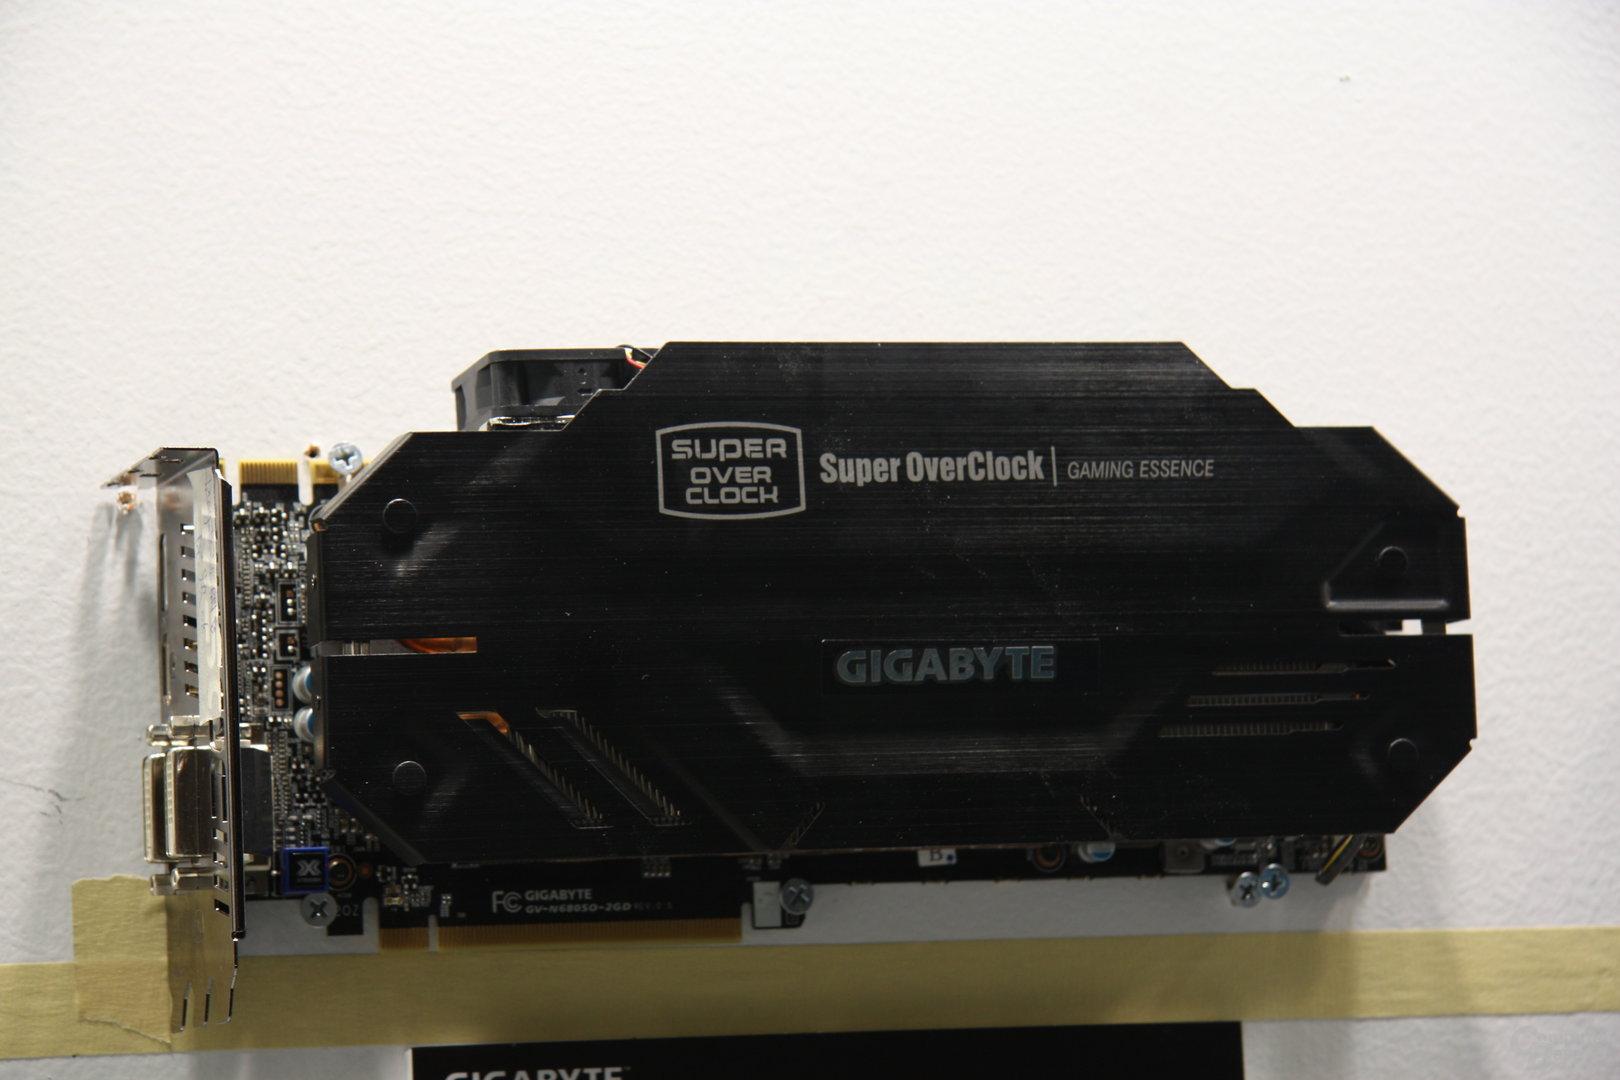 Gigabyte Geforce GTX 680 SO